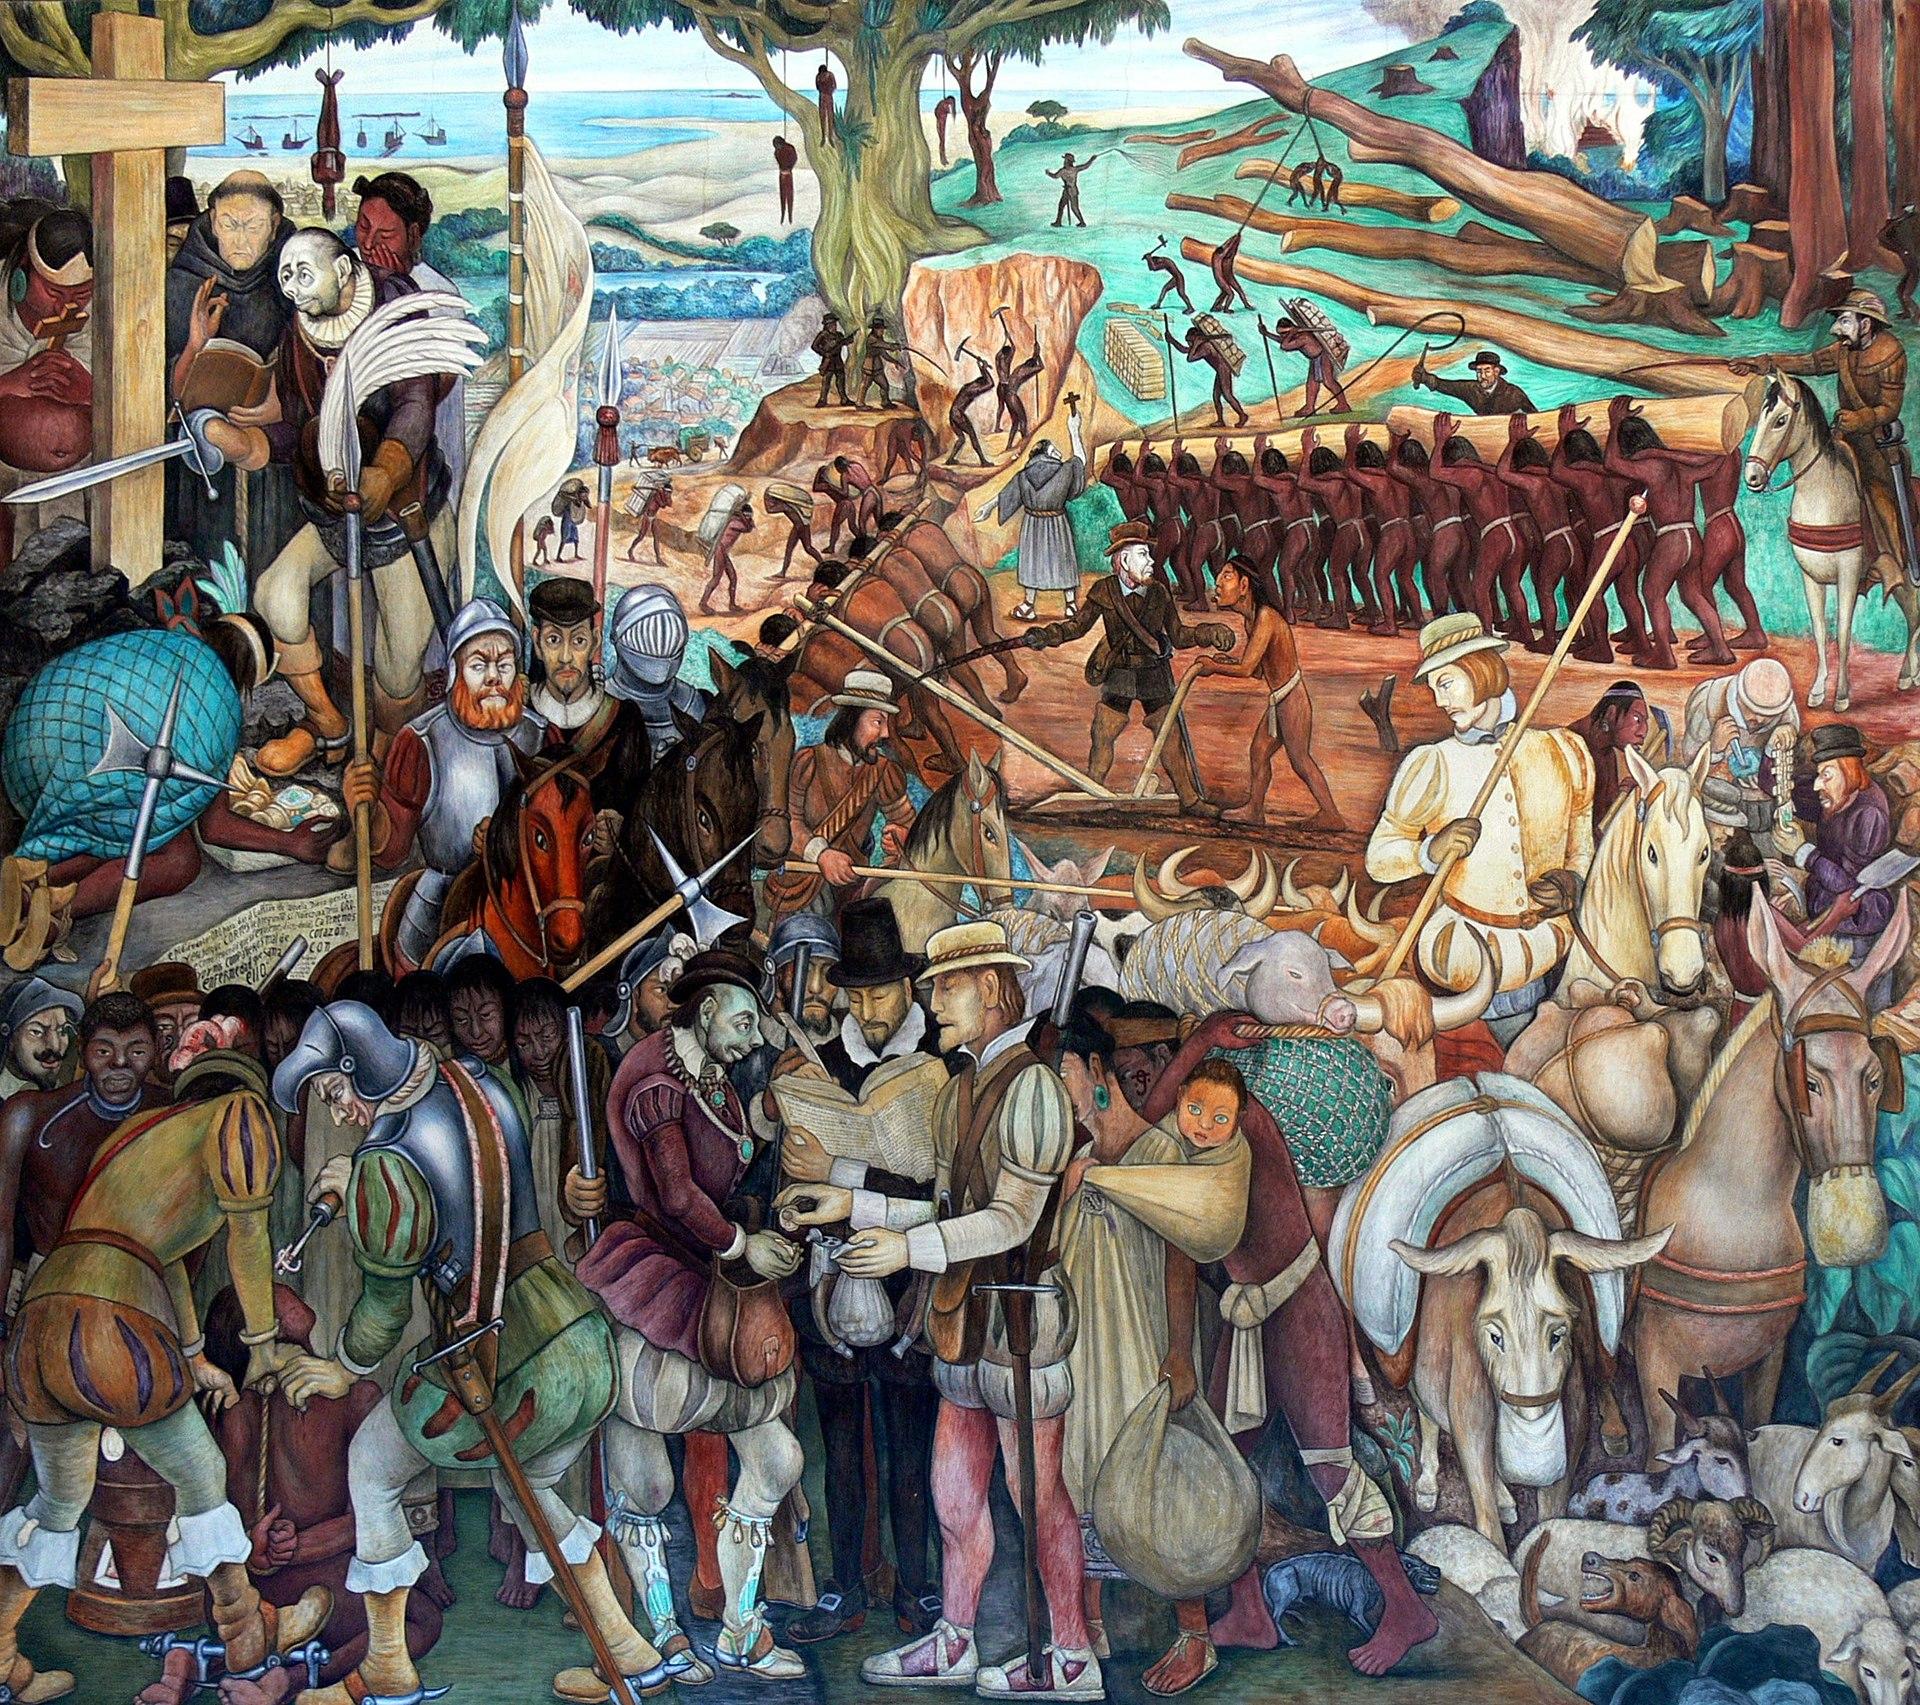 Diego Rivera - Mural of exploitation of Mexico by Spanish conquistadors, Palacio Nacional, Mexico City